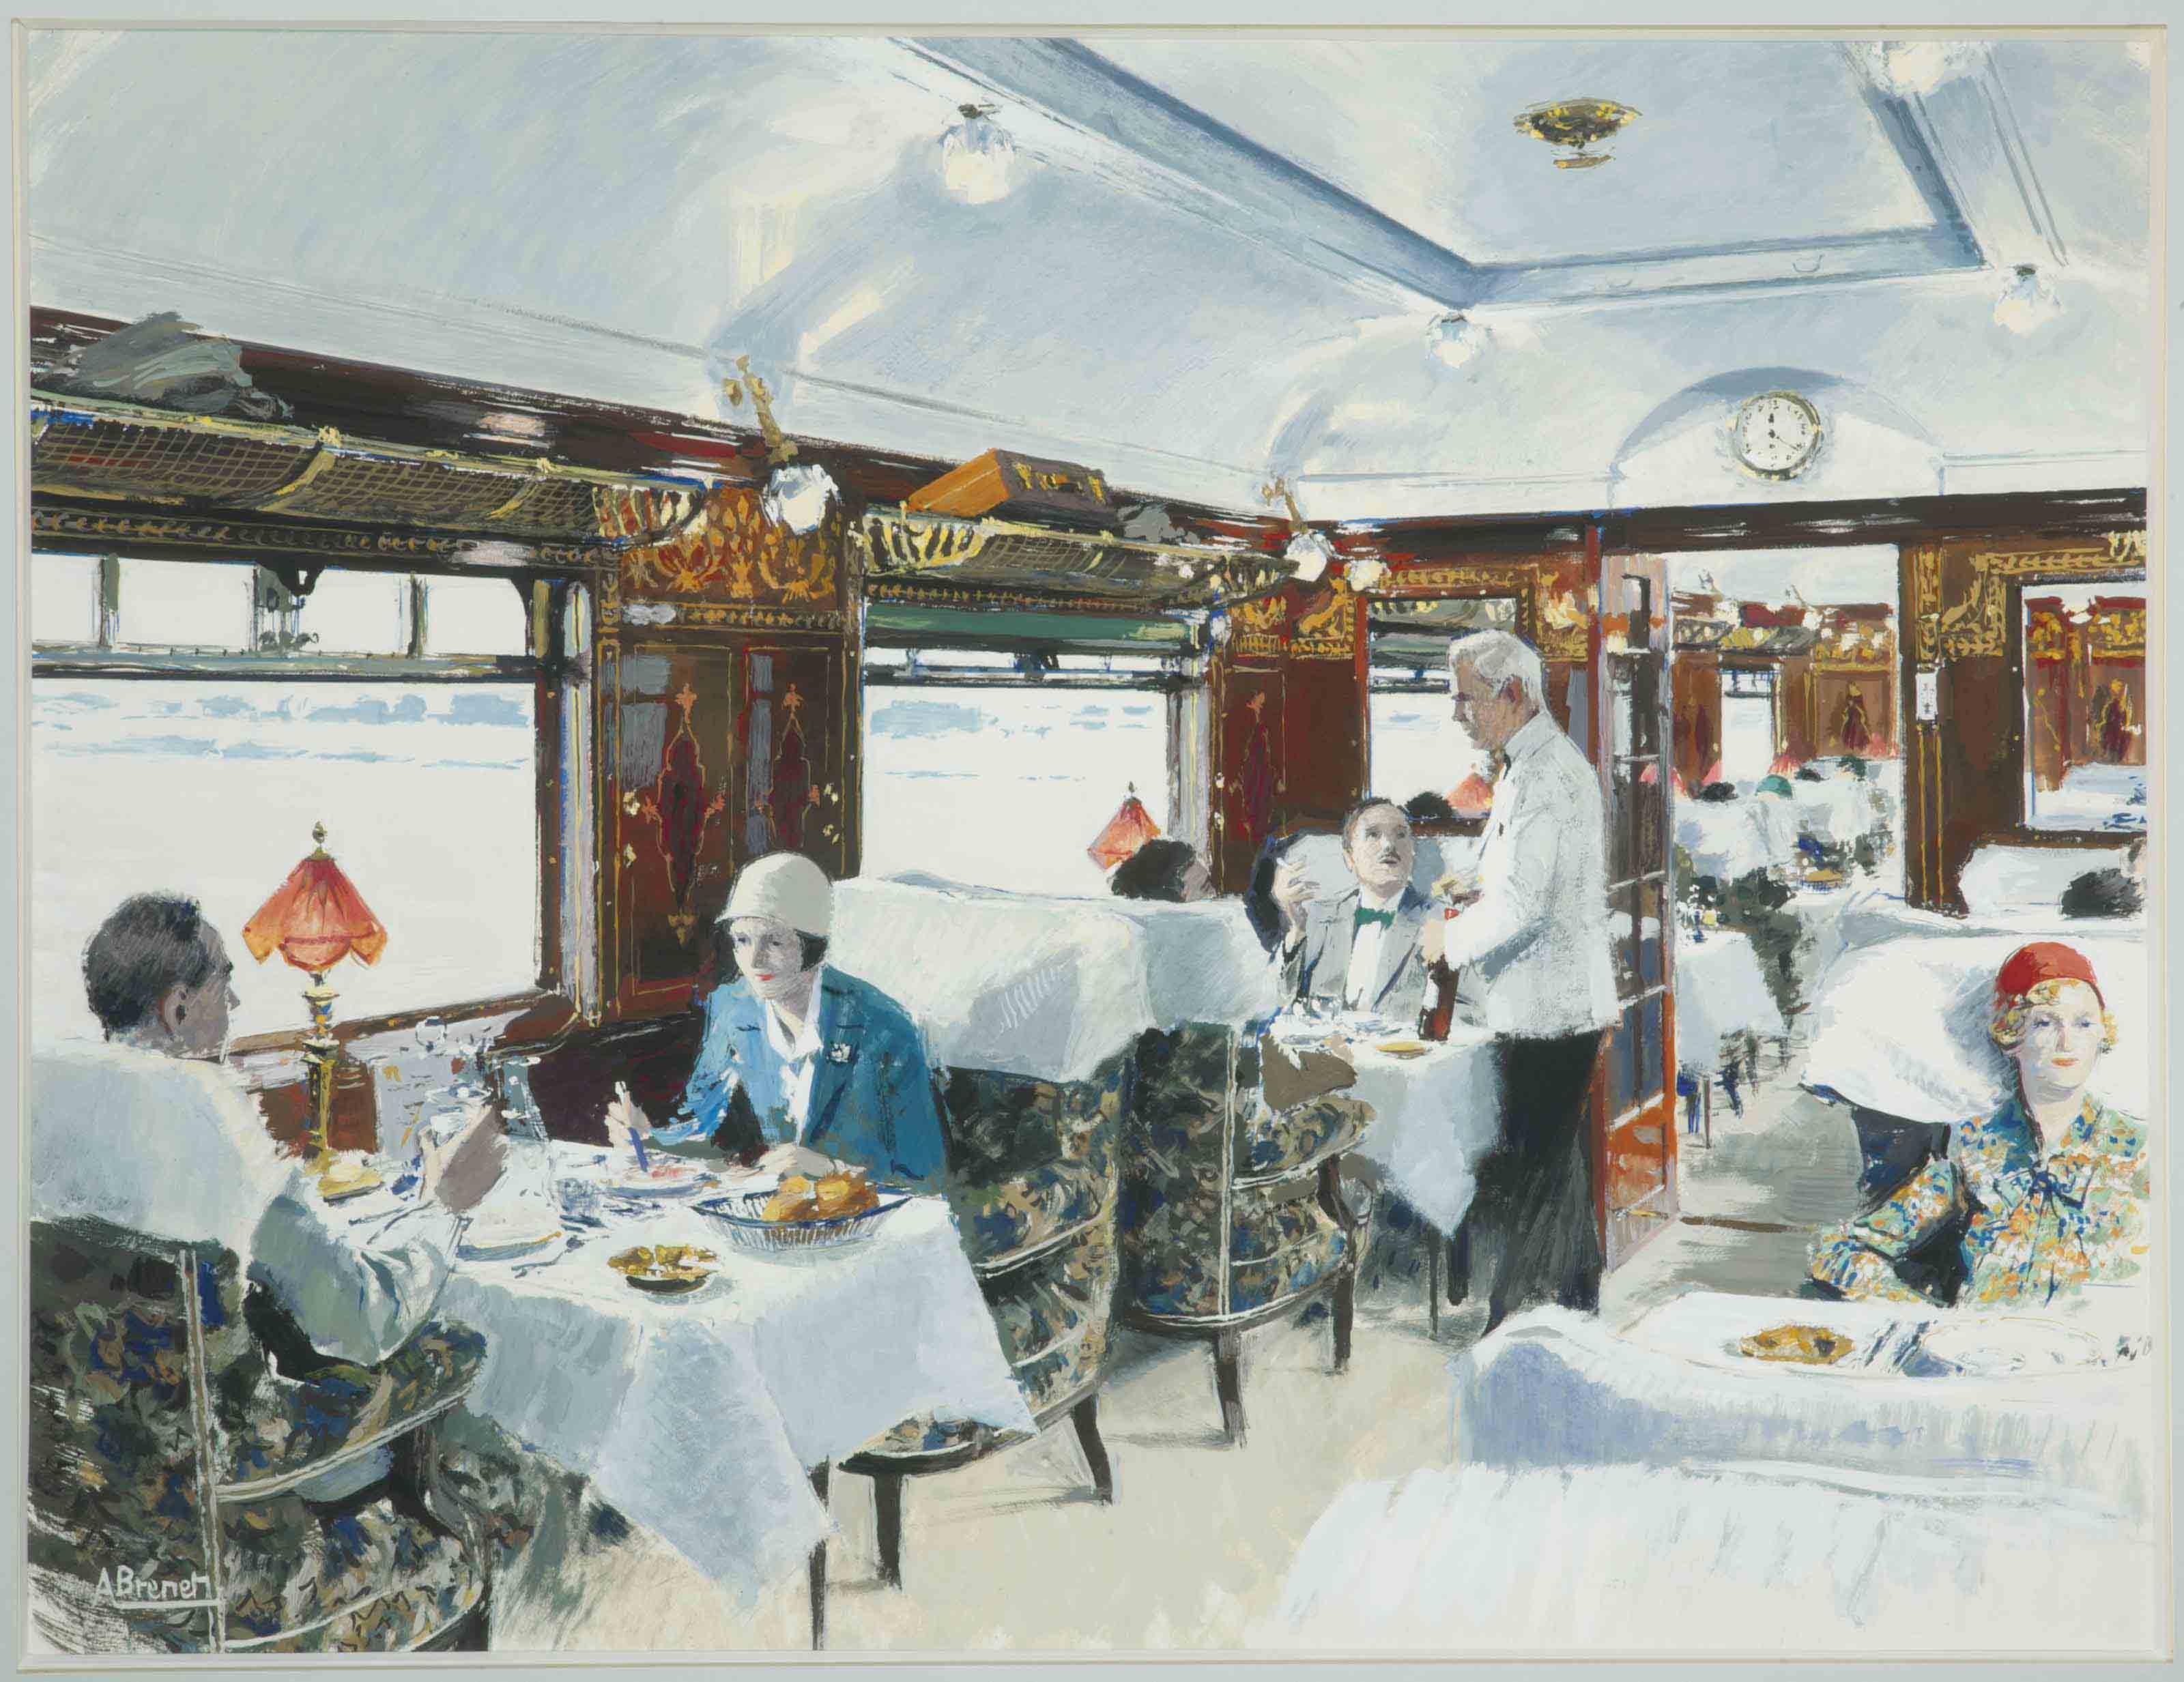 Le wagon-restaurant